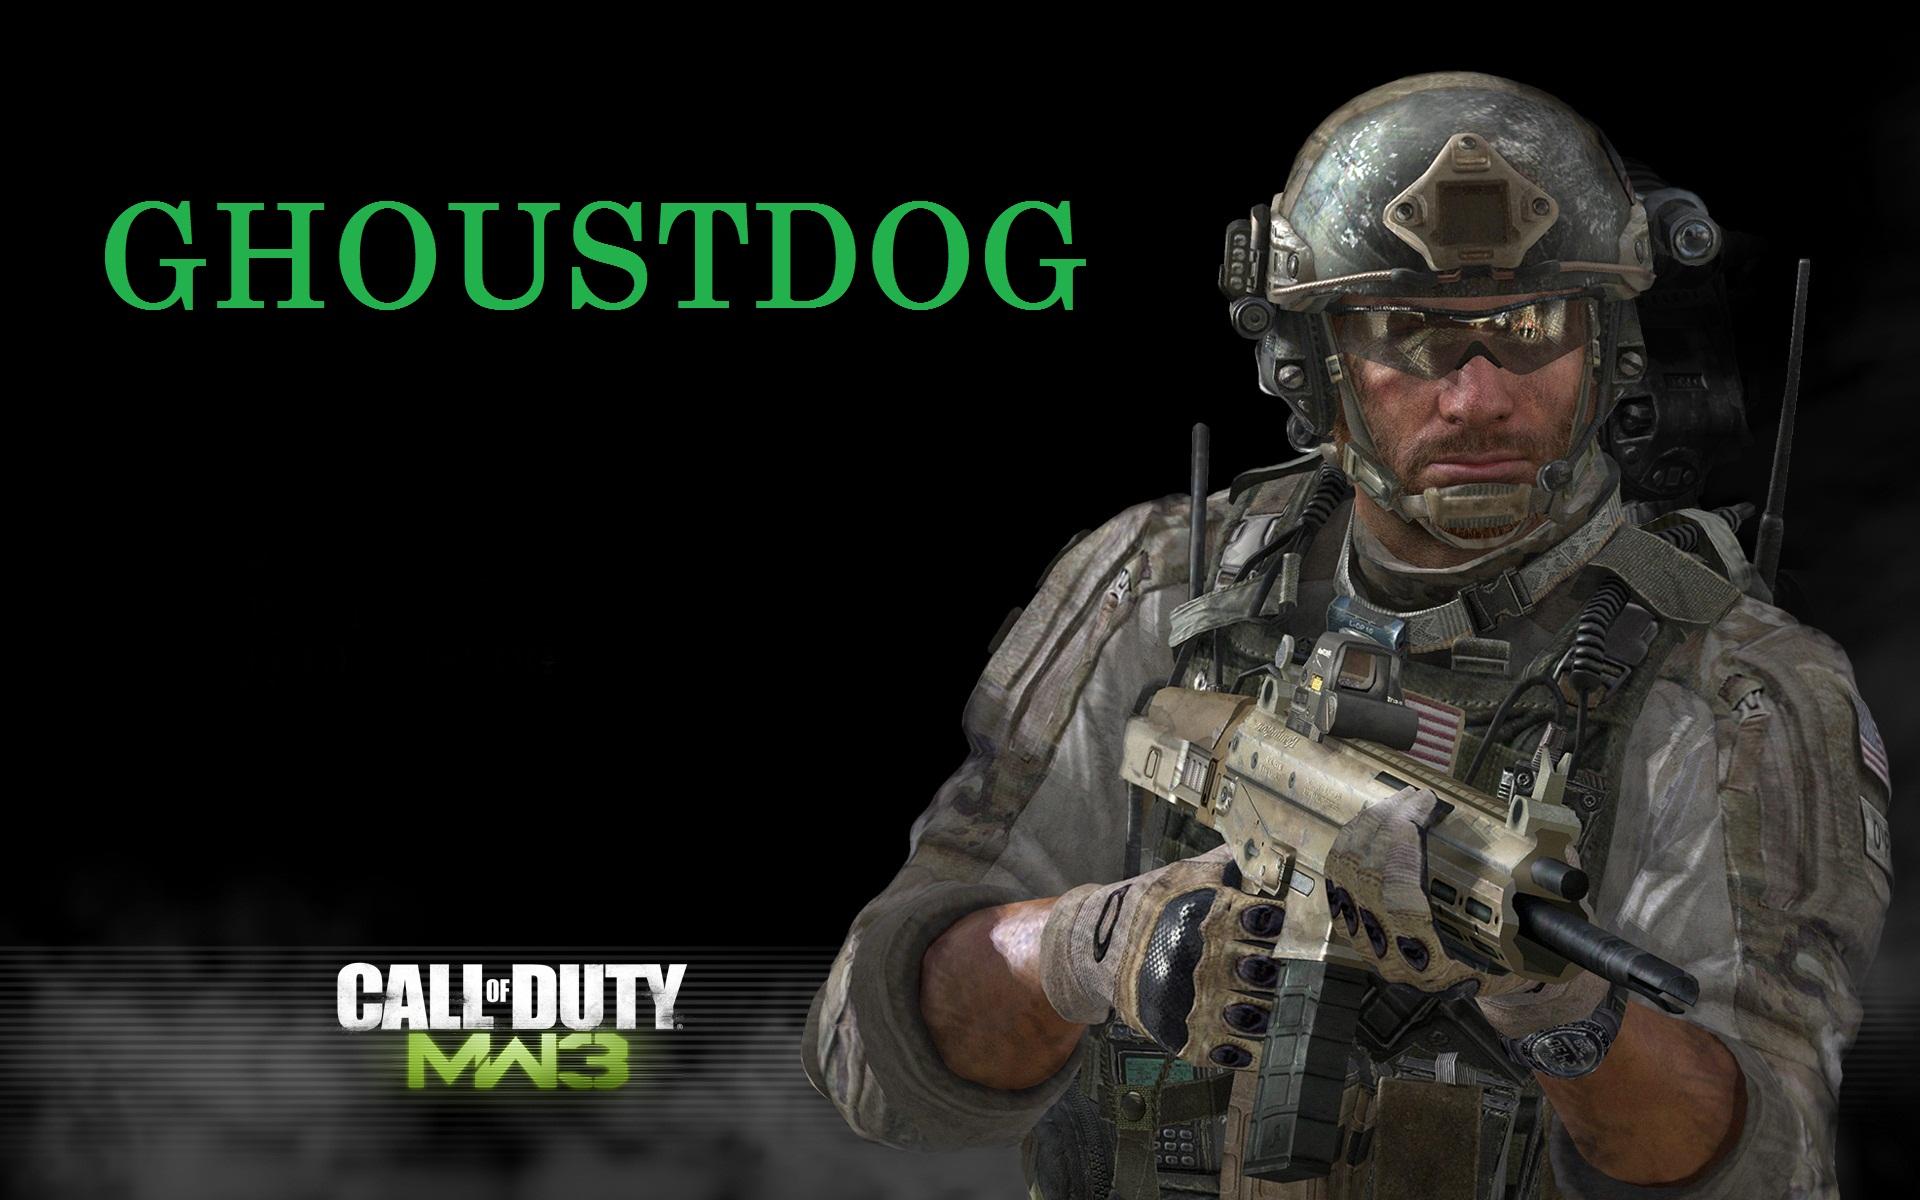 Call Of Duty Modern Warfare 3 Mw3 Wallpaper